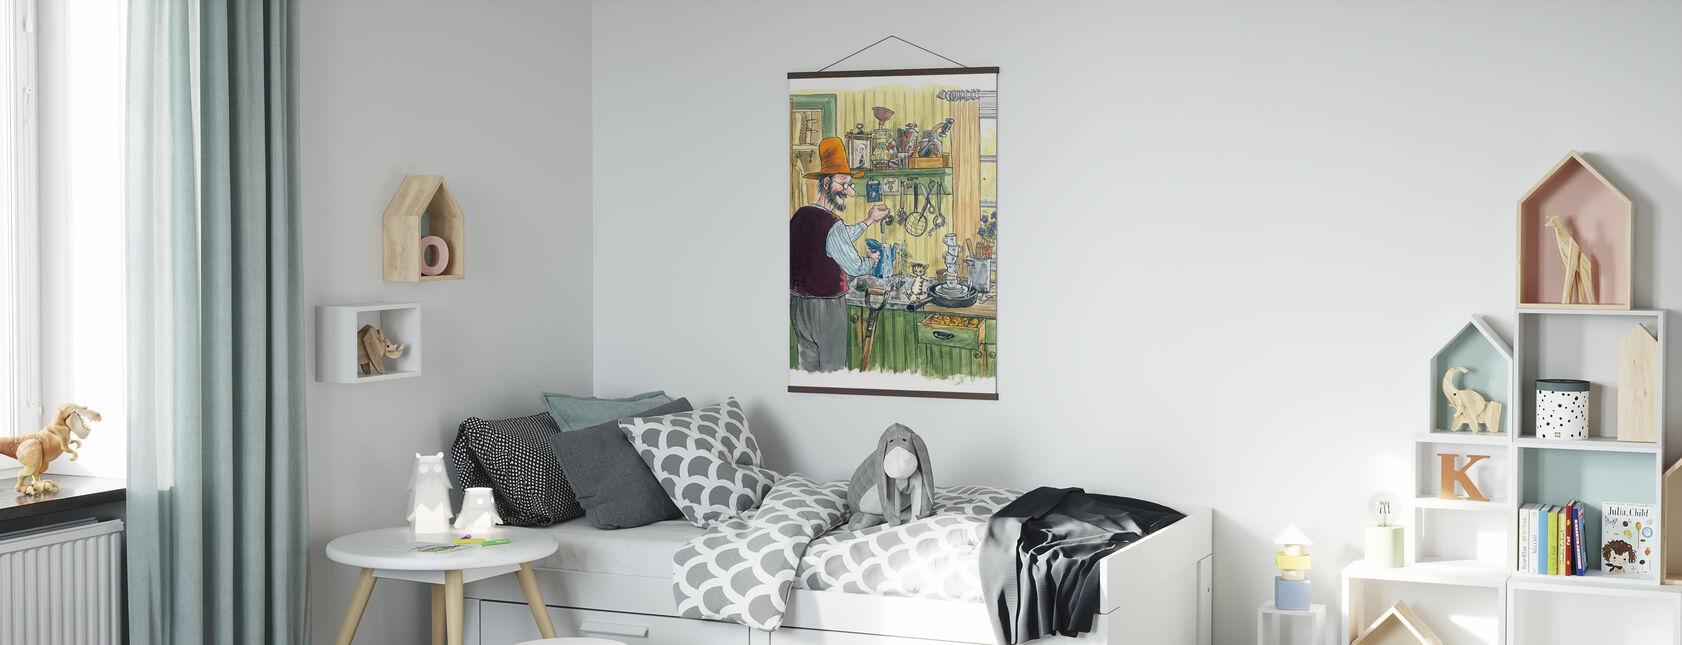 When Findus was little - Poster - Kids Room